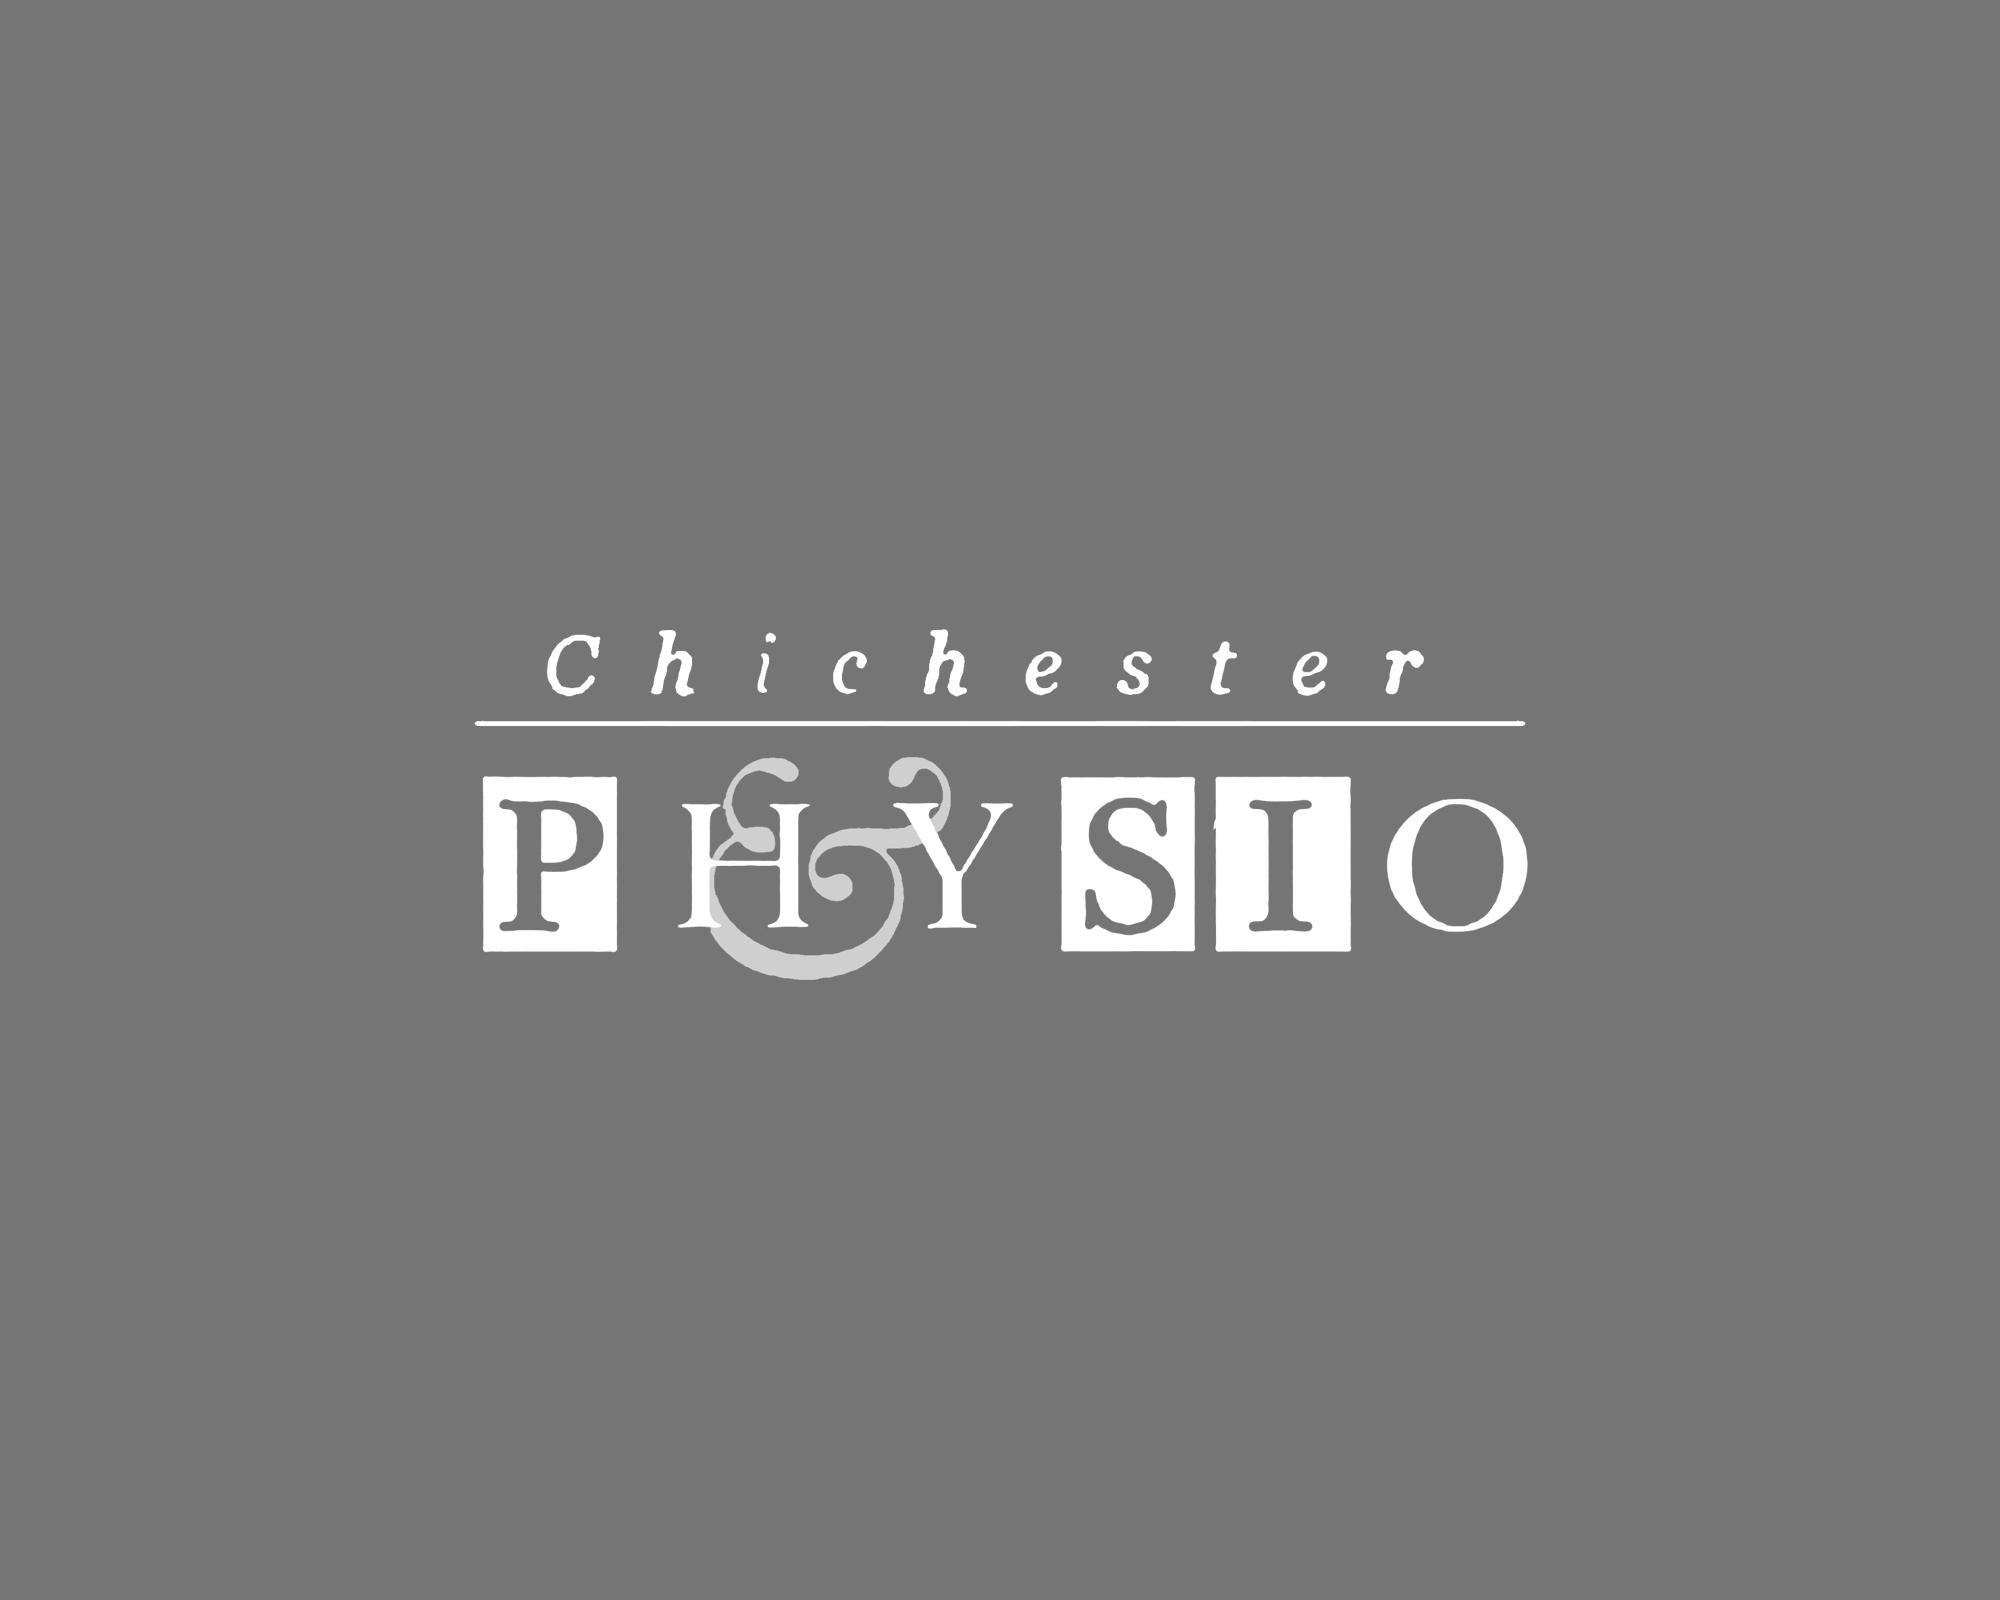 chichester physio Logo